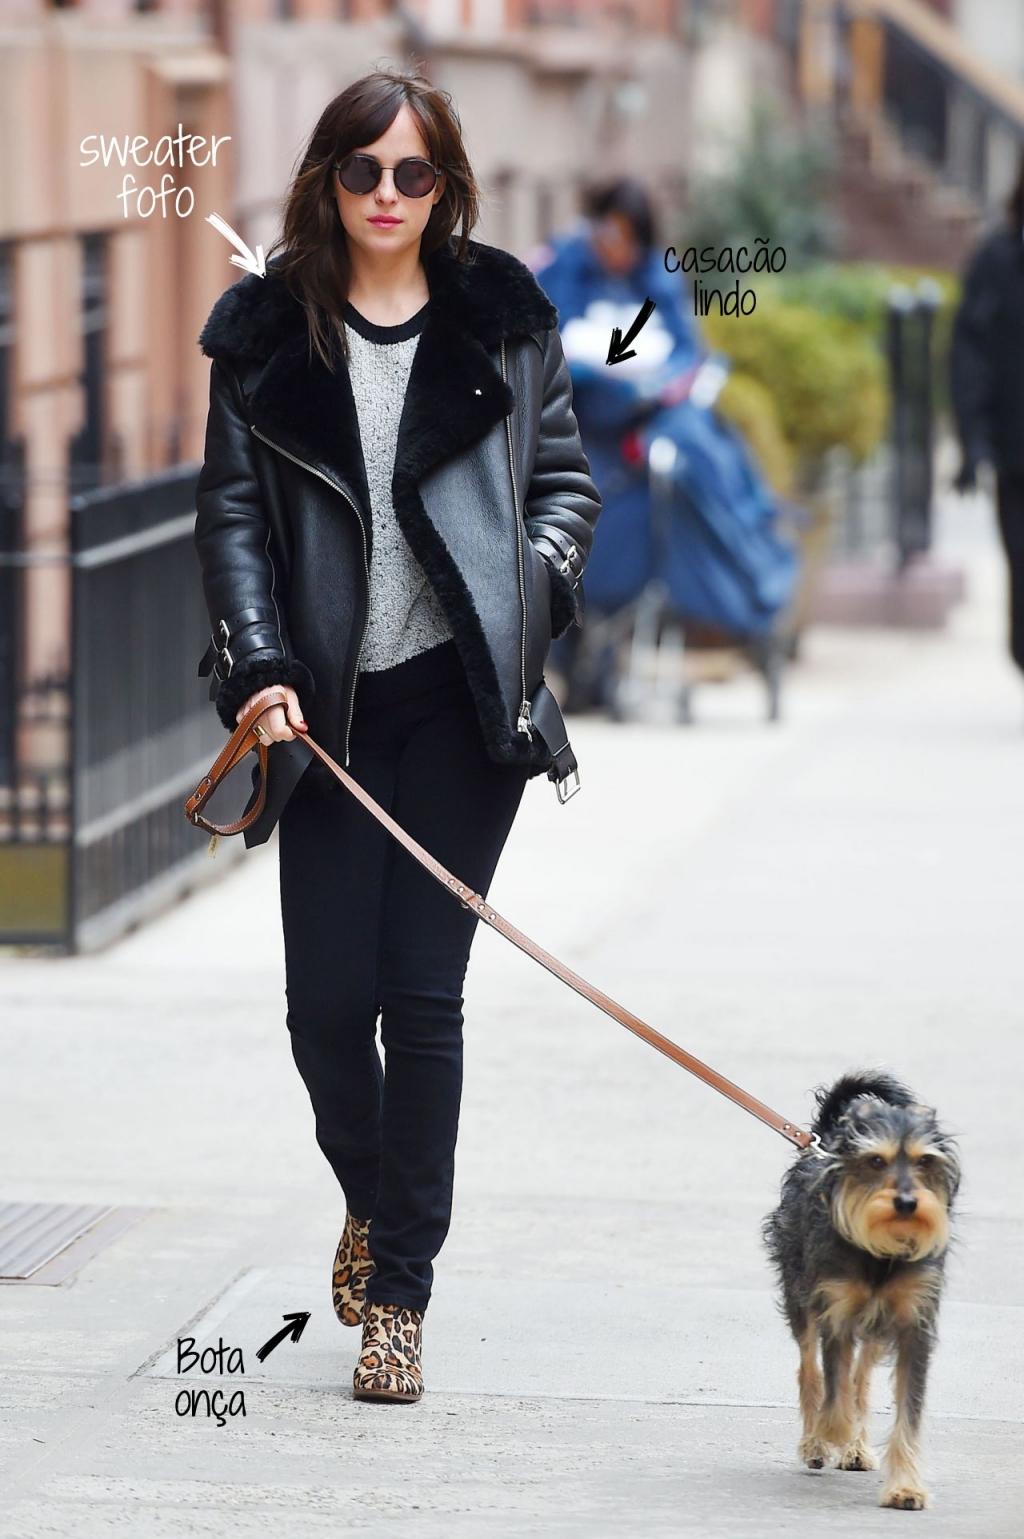 dakota-johnson-casual-outfit-new-york-city-april-2015_6